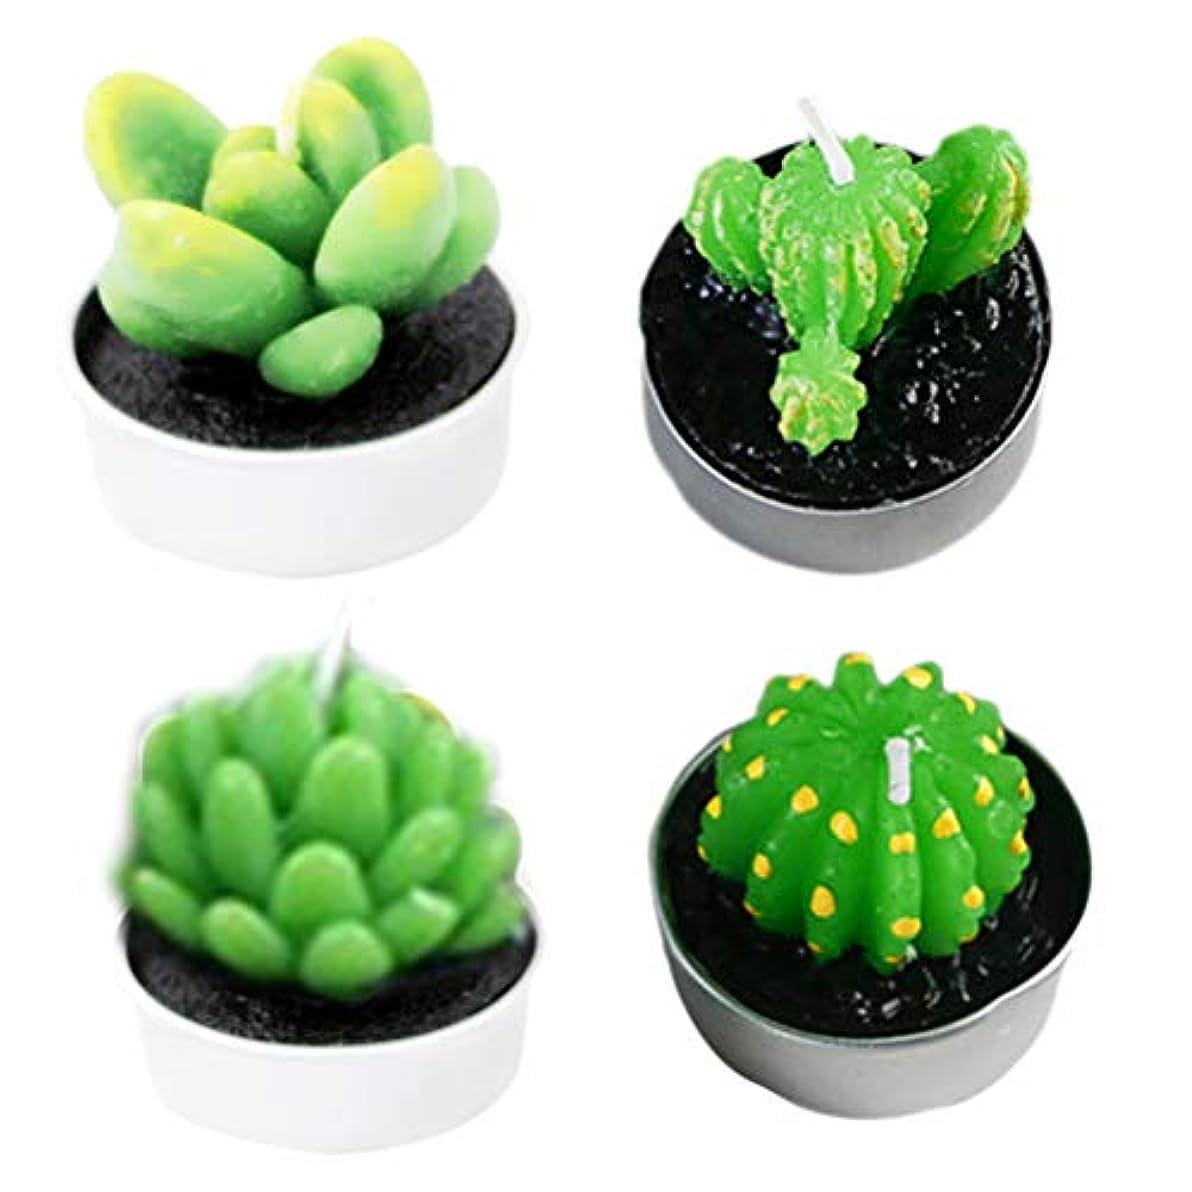 BESTOYARD 6本スパイシーなサボテンキャンドルミニ装飾植物の形のキャンドルスパのホームクリスマスウェディングパーティデコレーションギフト(ランダムスタイル)